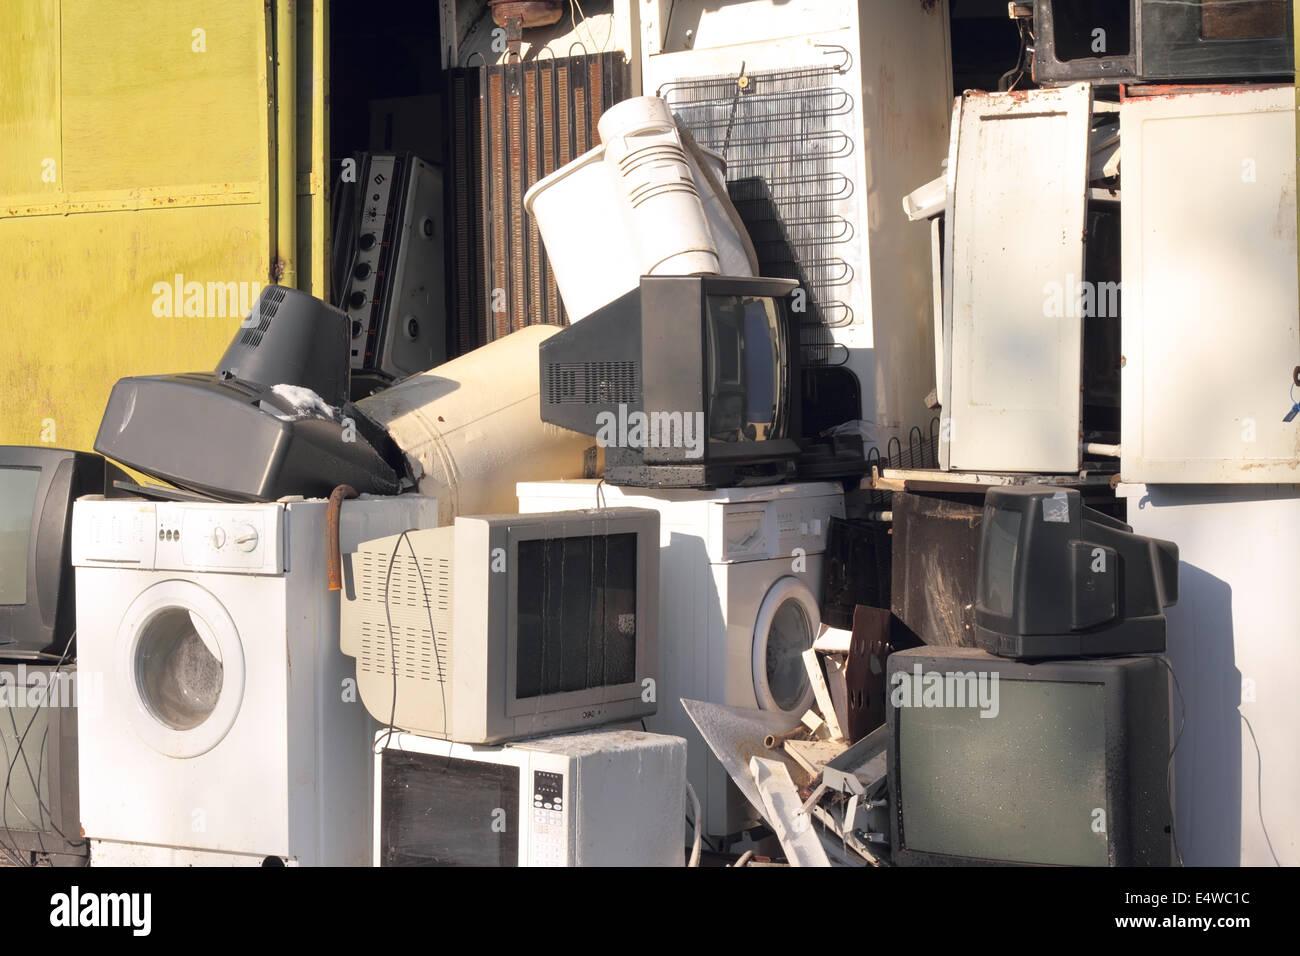 Dump the old broken appliances - Stock Image